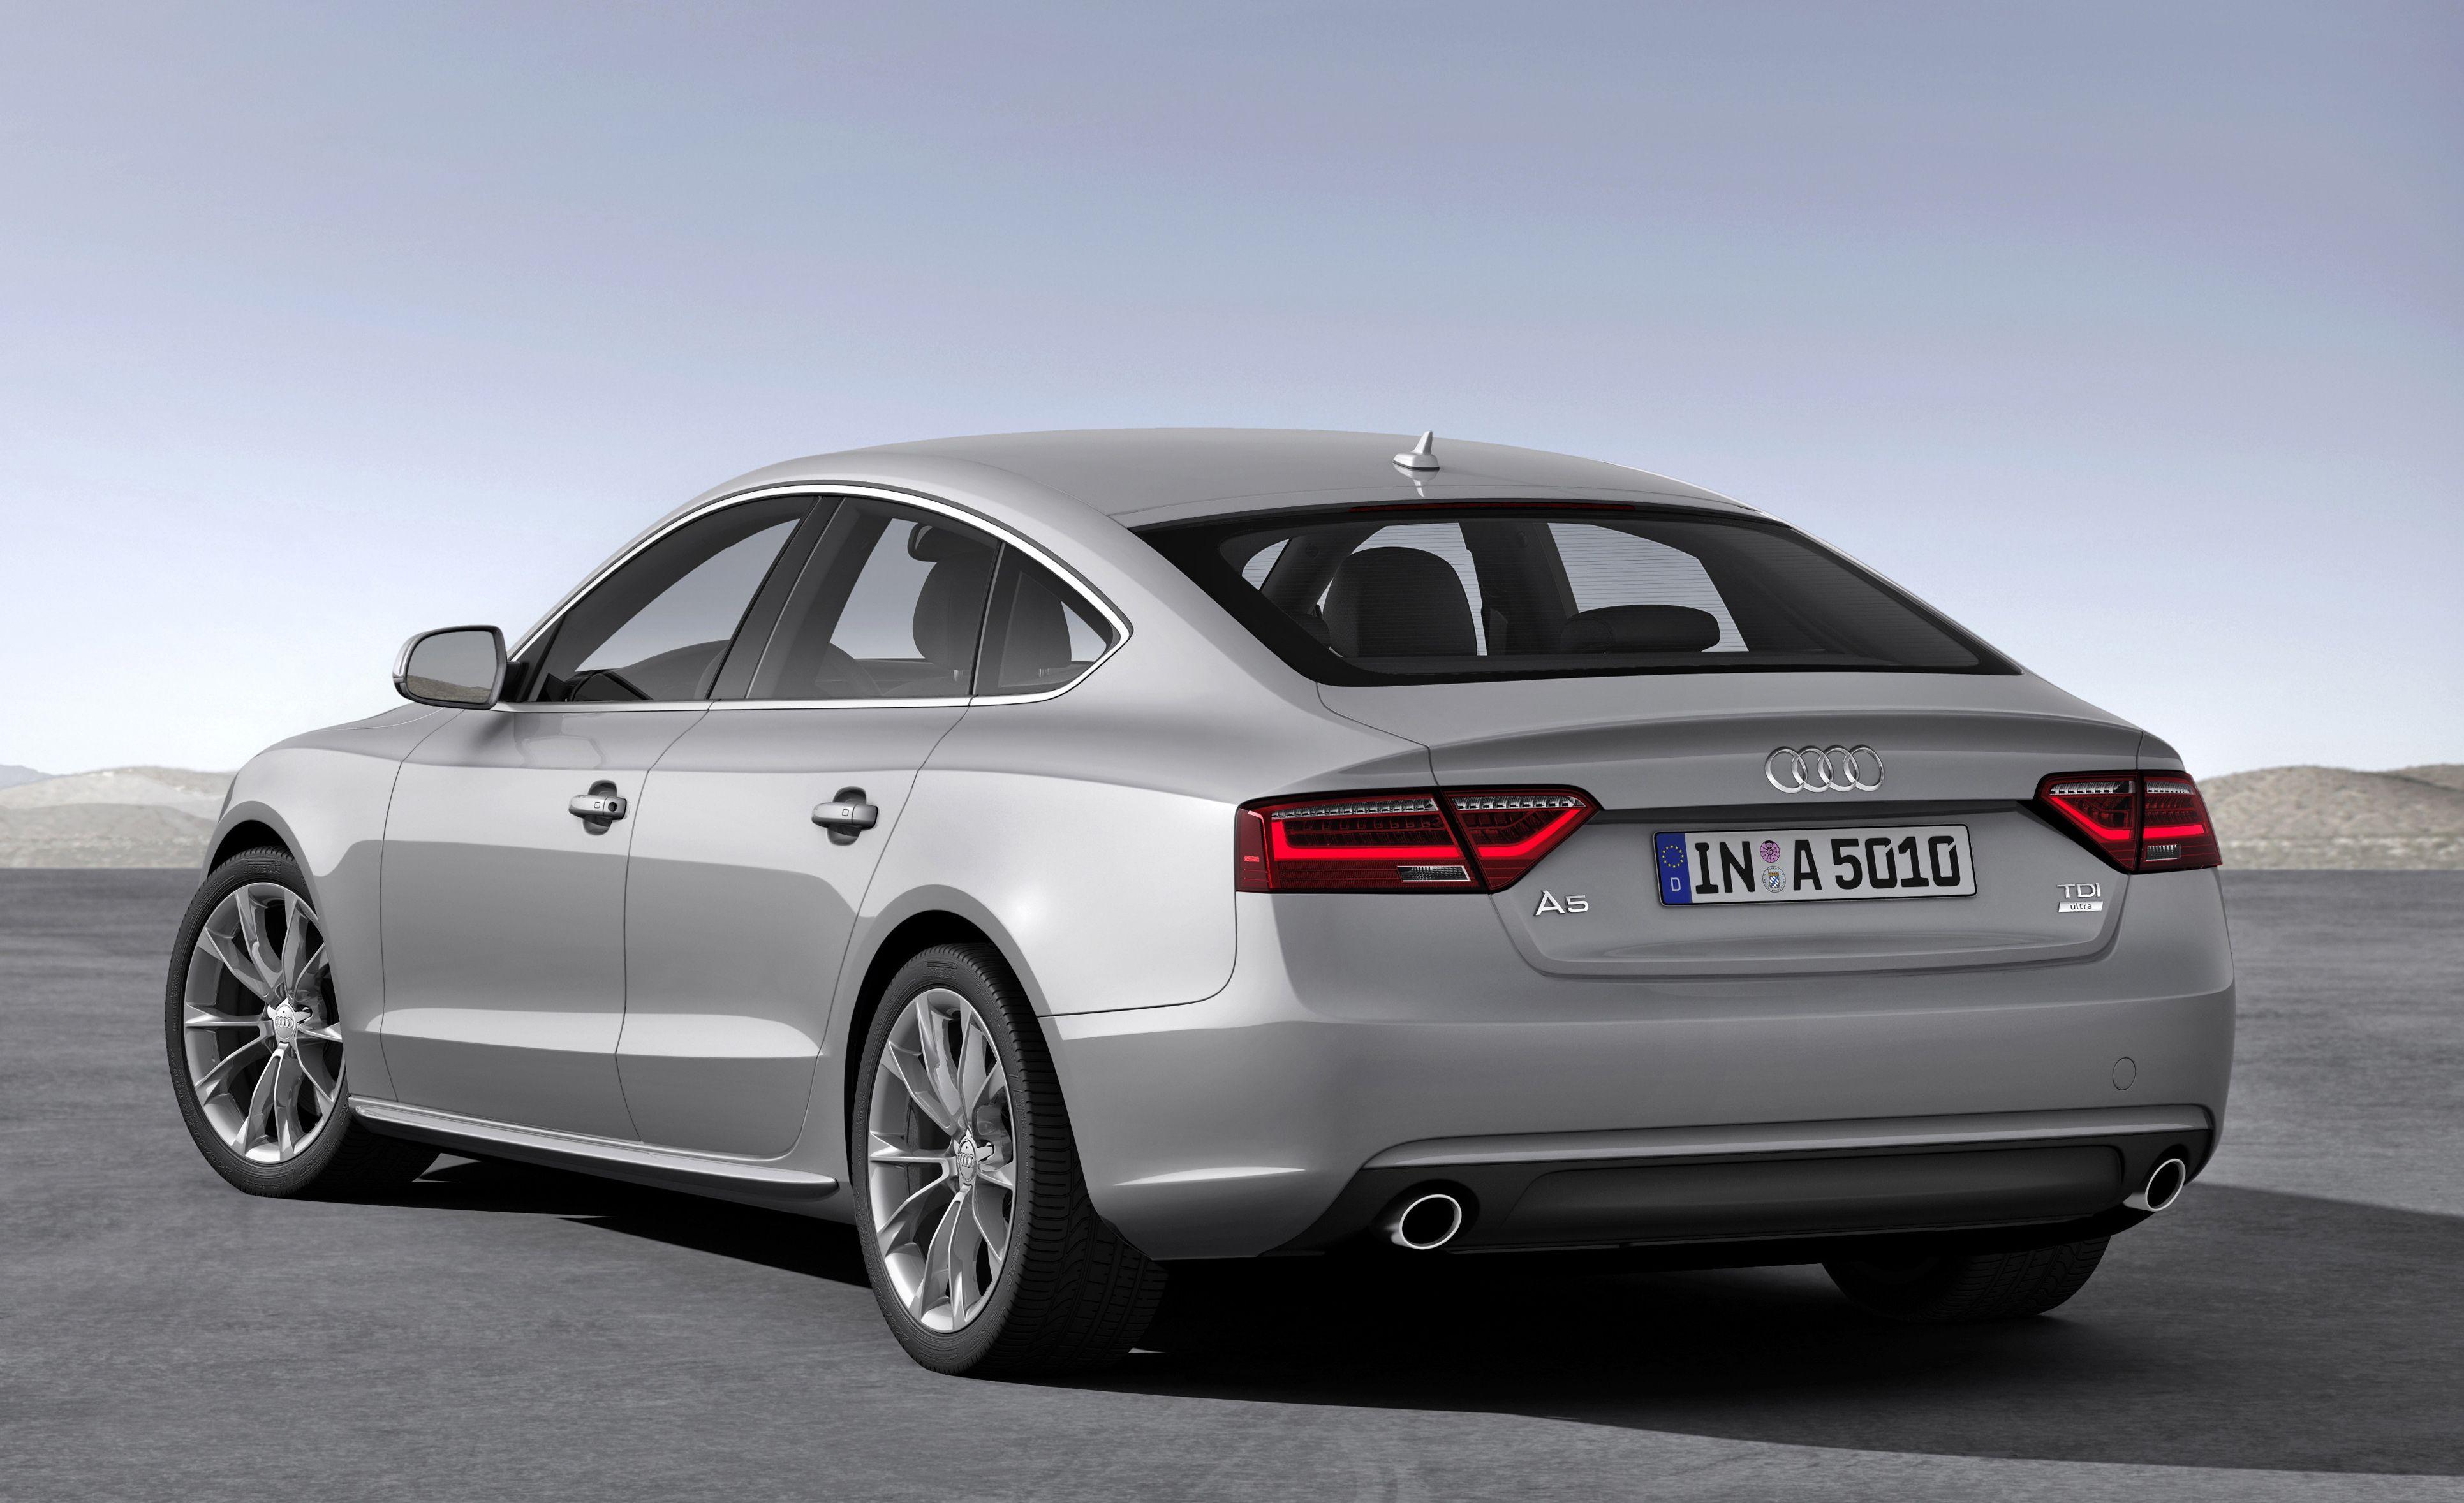 Alargecopyjpg Luxury Cars Pinterest - Audi car models with price